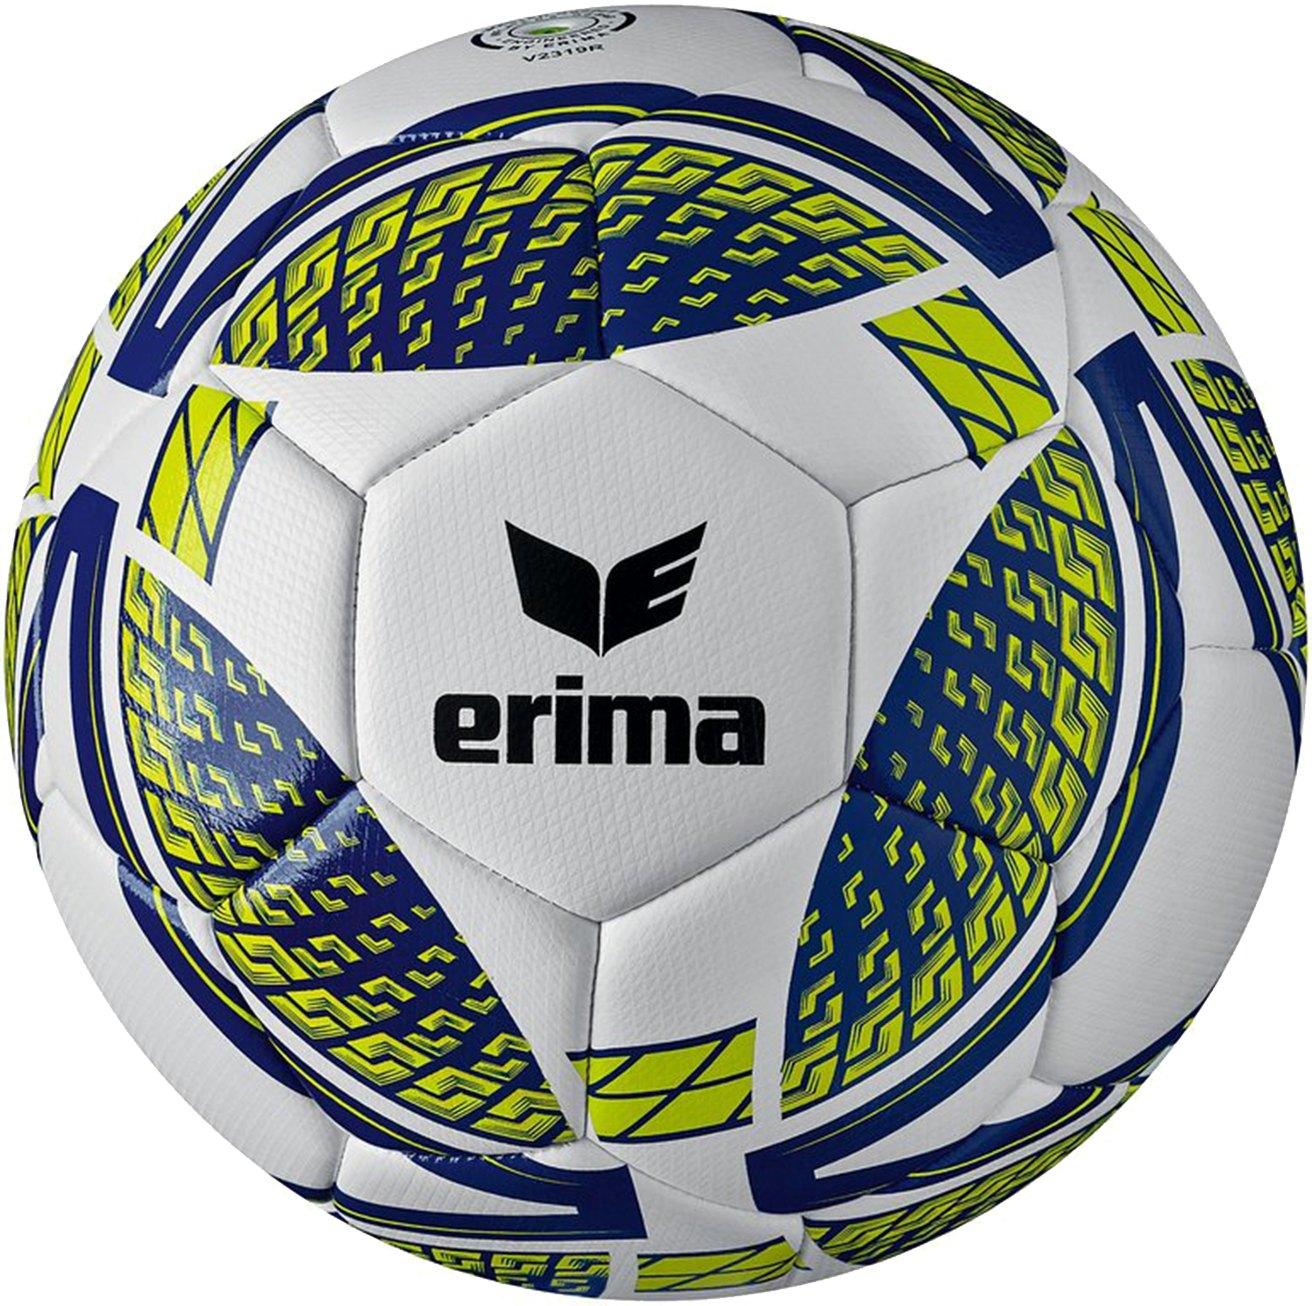 Erima Senzor Fussball 430 Gramm Gr. 5 Blau - blau